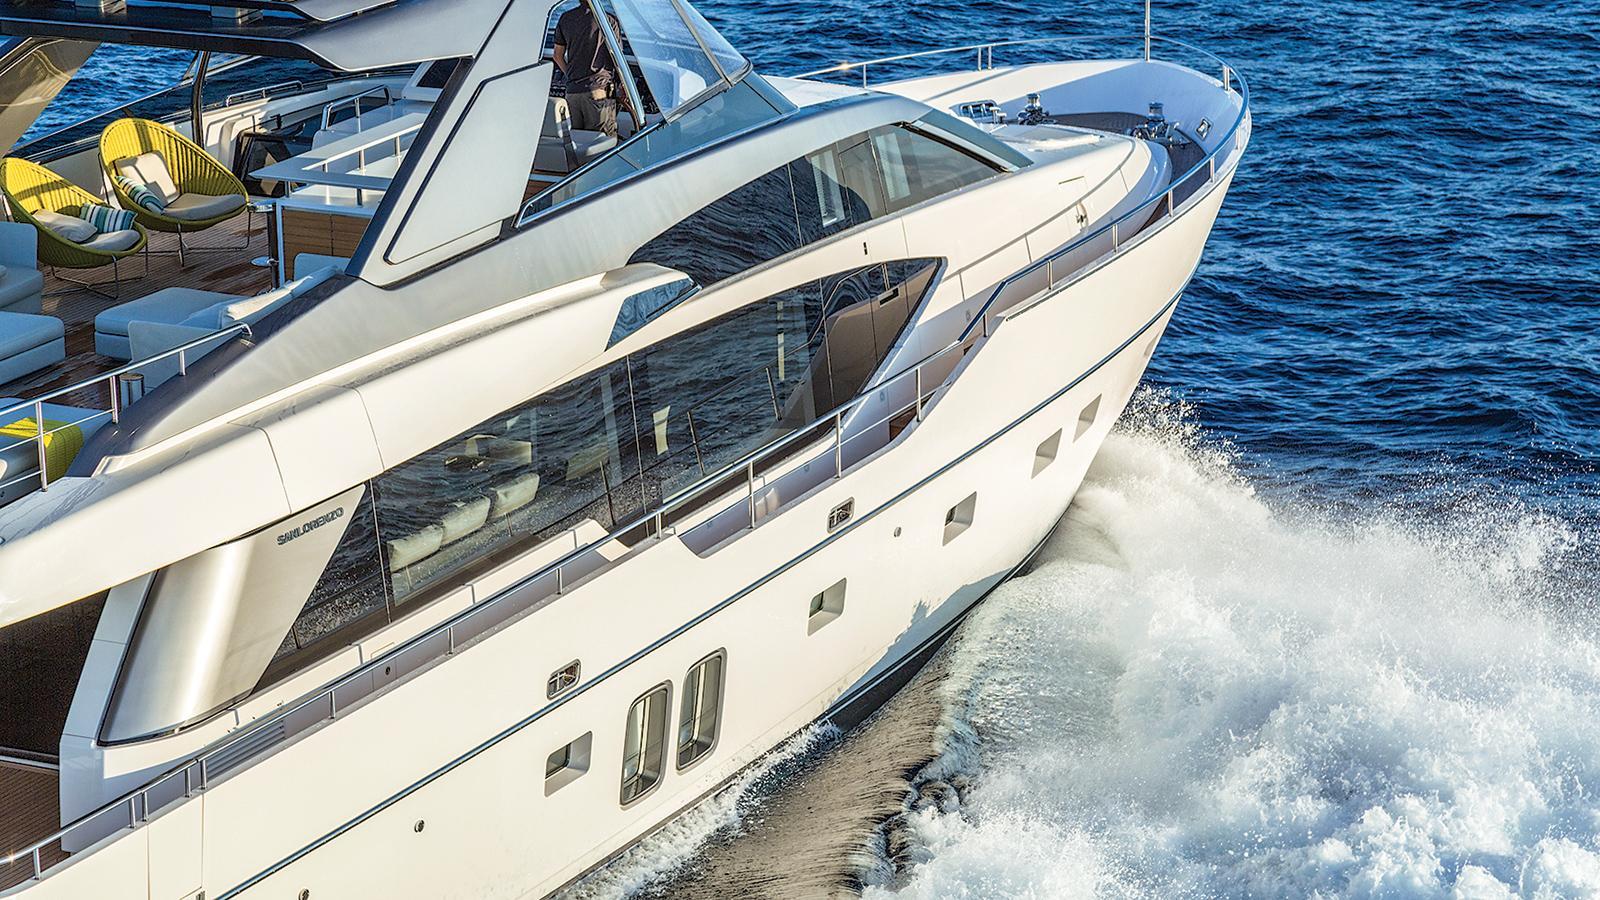 hull 651 motoryacht sanlorenzo sl86 27m 2016 cruising credit jim raycroft